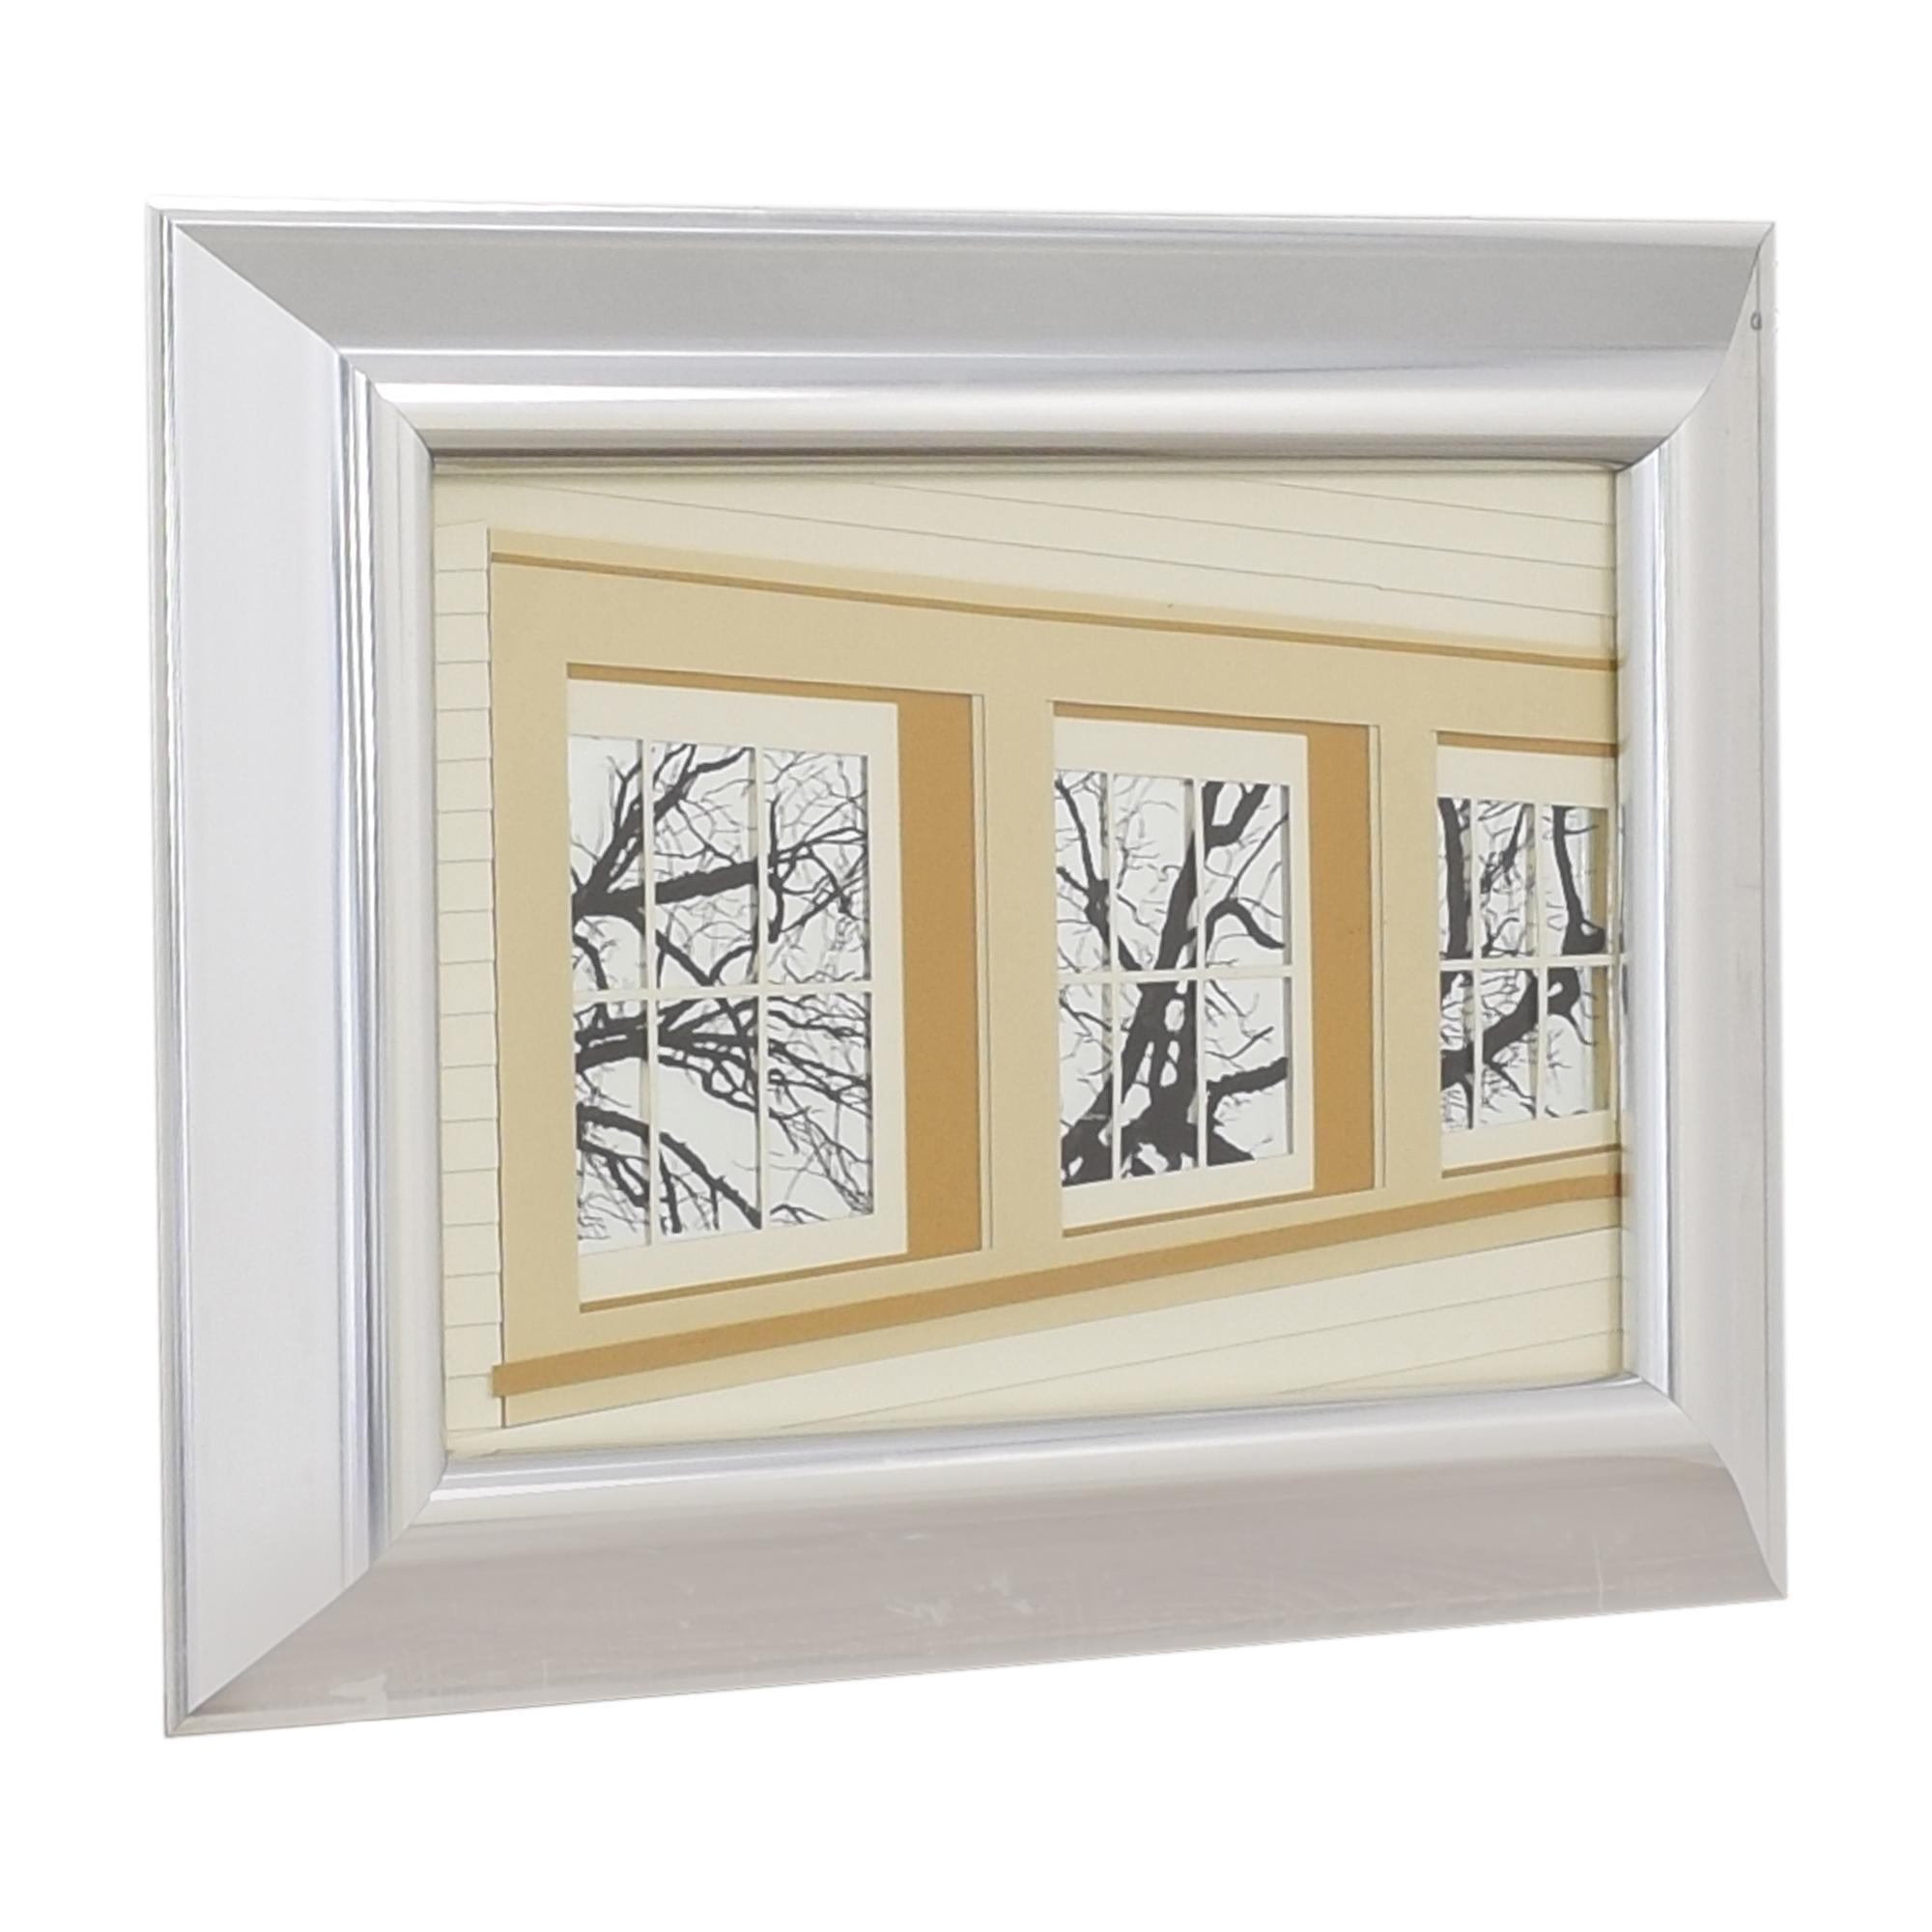 Greg Copeland 1123 Framed Art second hand